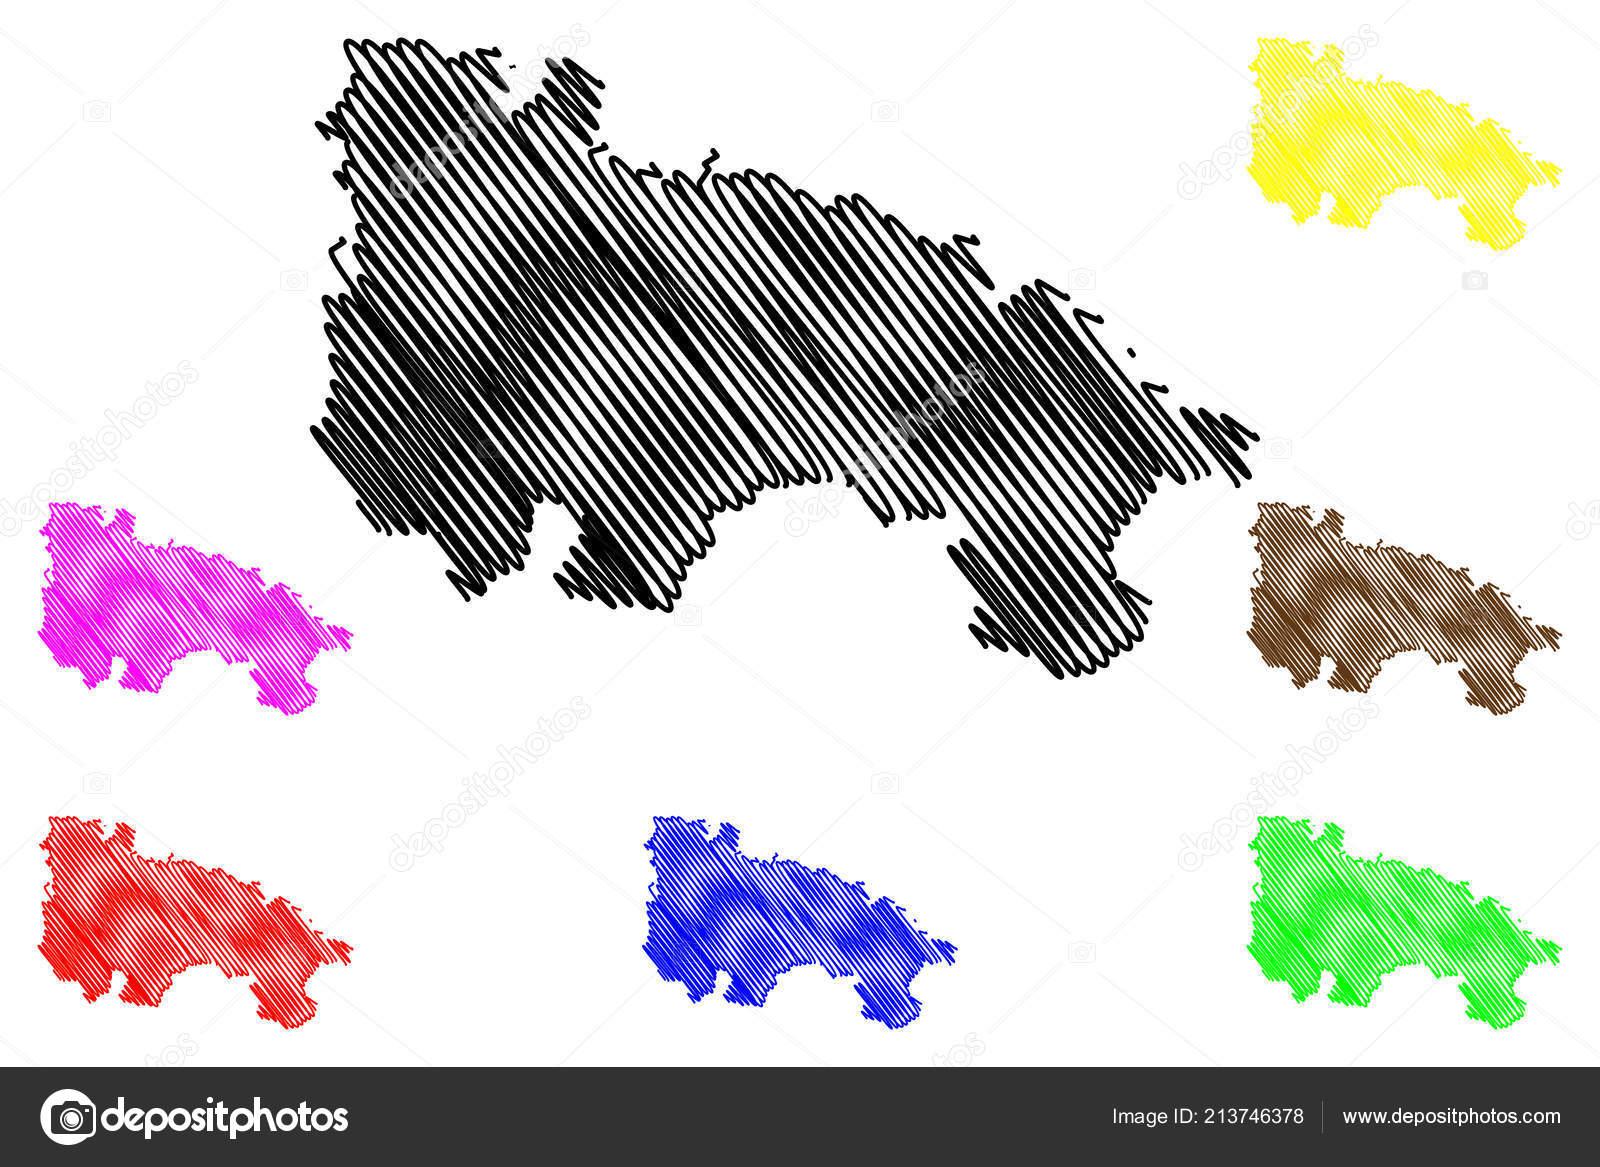 Autonome Regionen Spanien Karte.Rioja Konigreich Von Spanien Autonome Region Karte Vektor